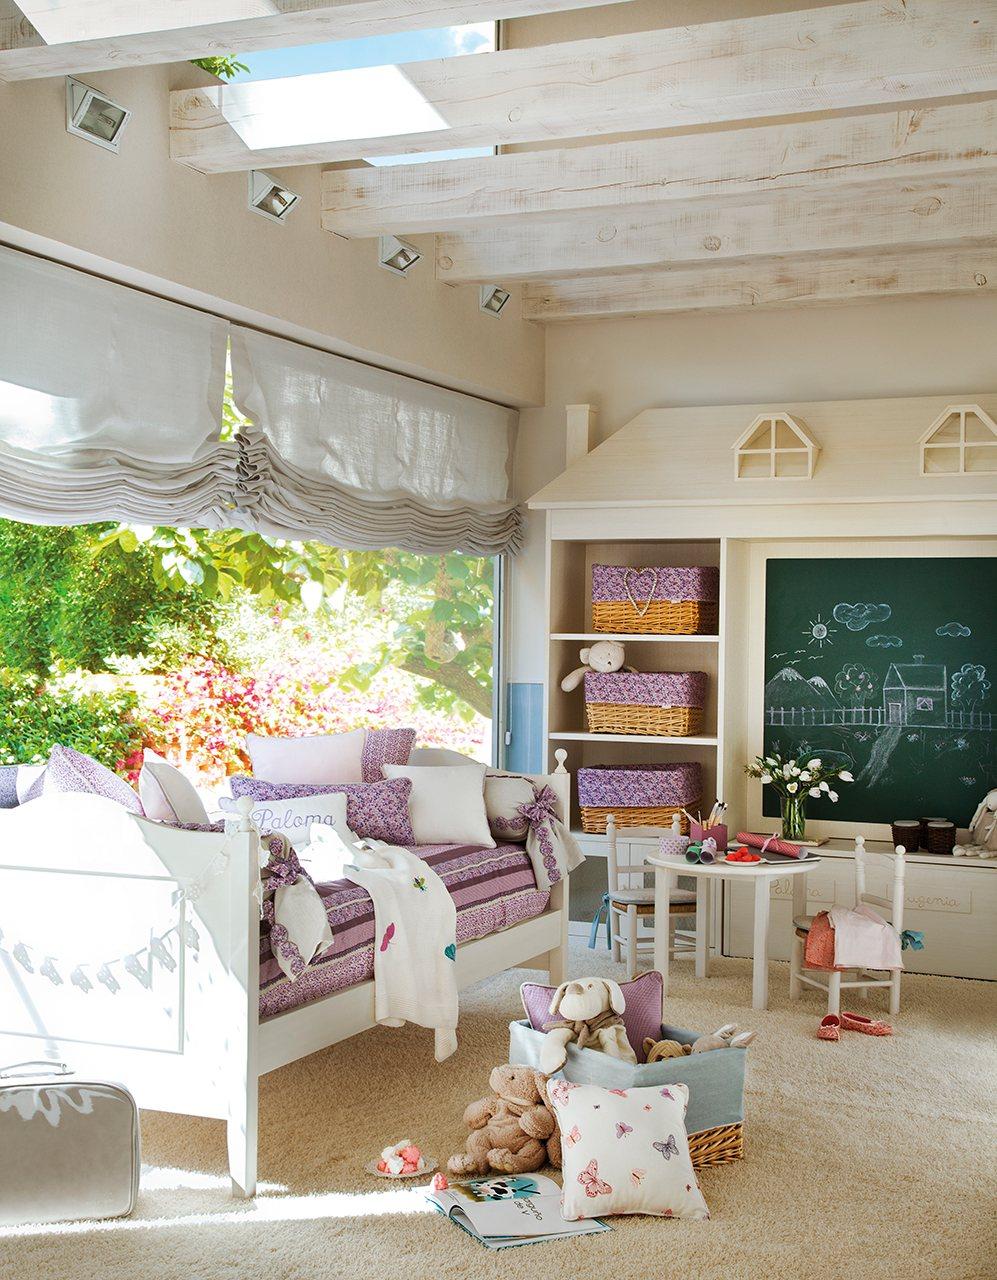 6 детских комнаты с намеком на учебу